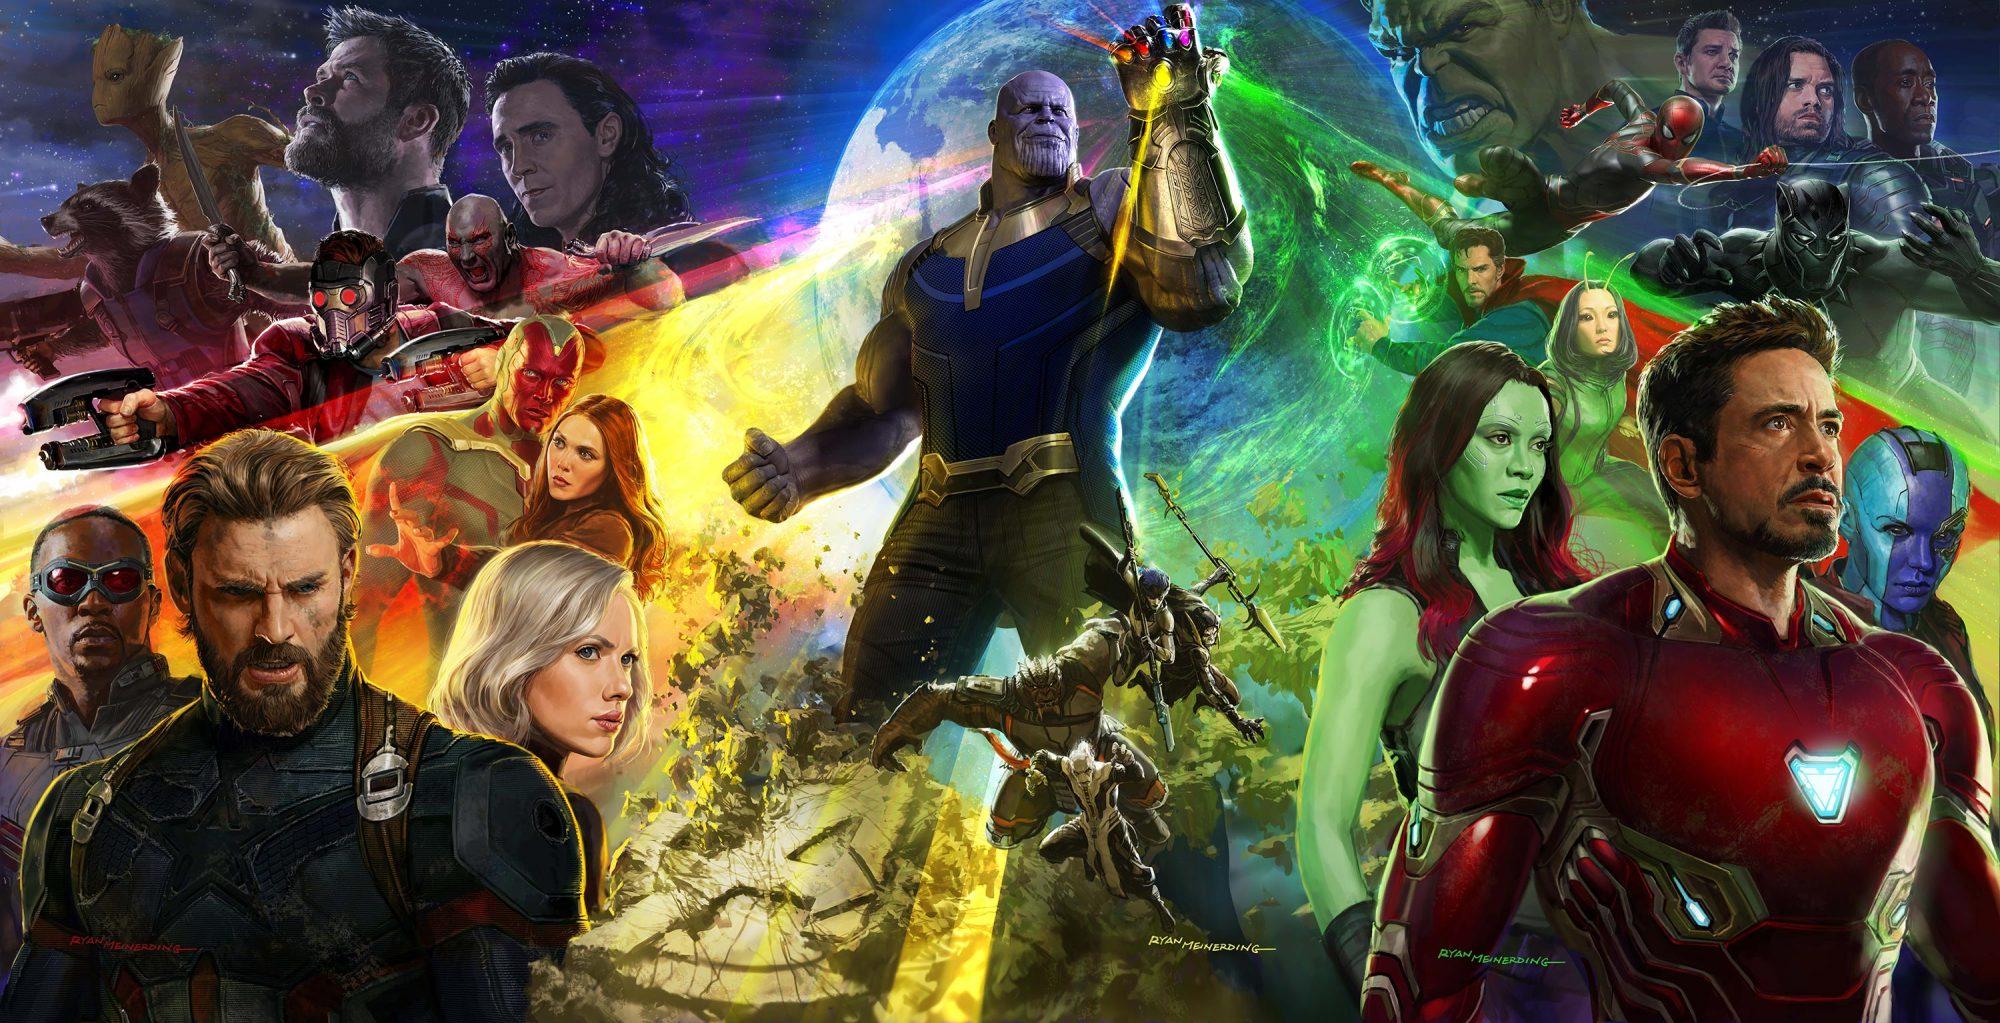 Marvel Studios' AVENGERS: INFINITY WAR Concept Art